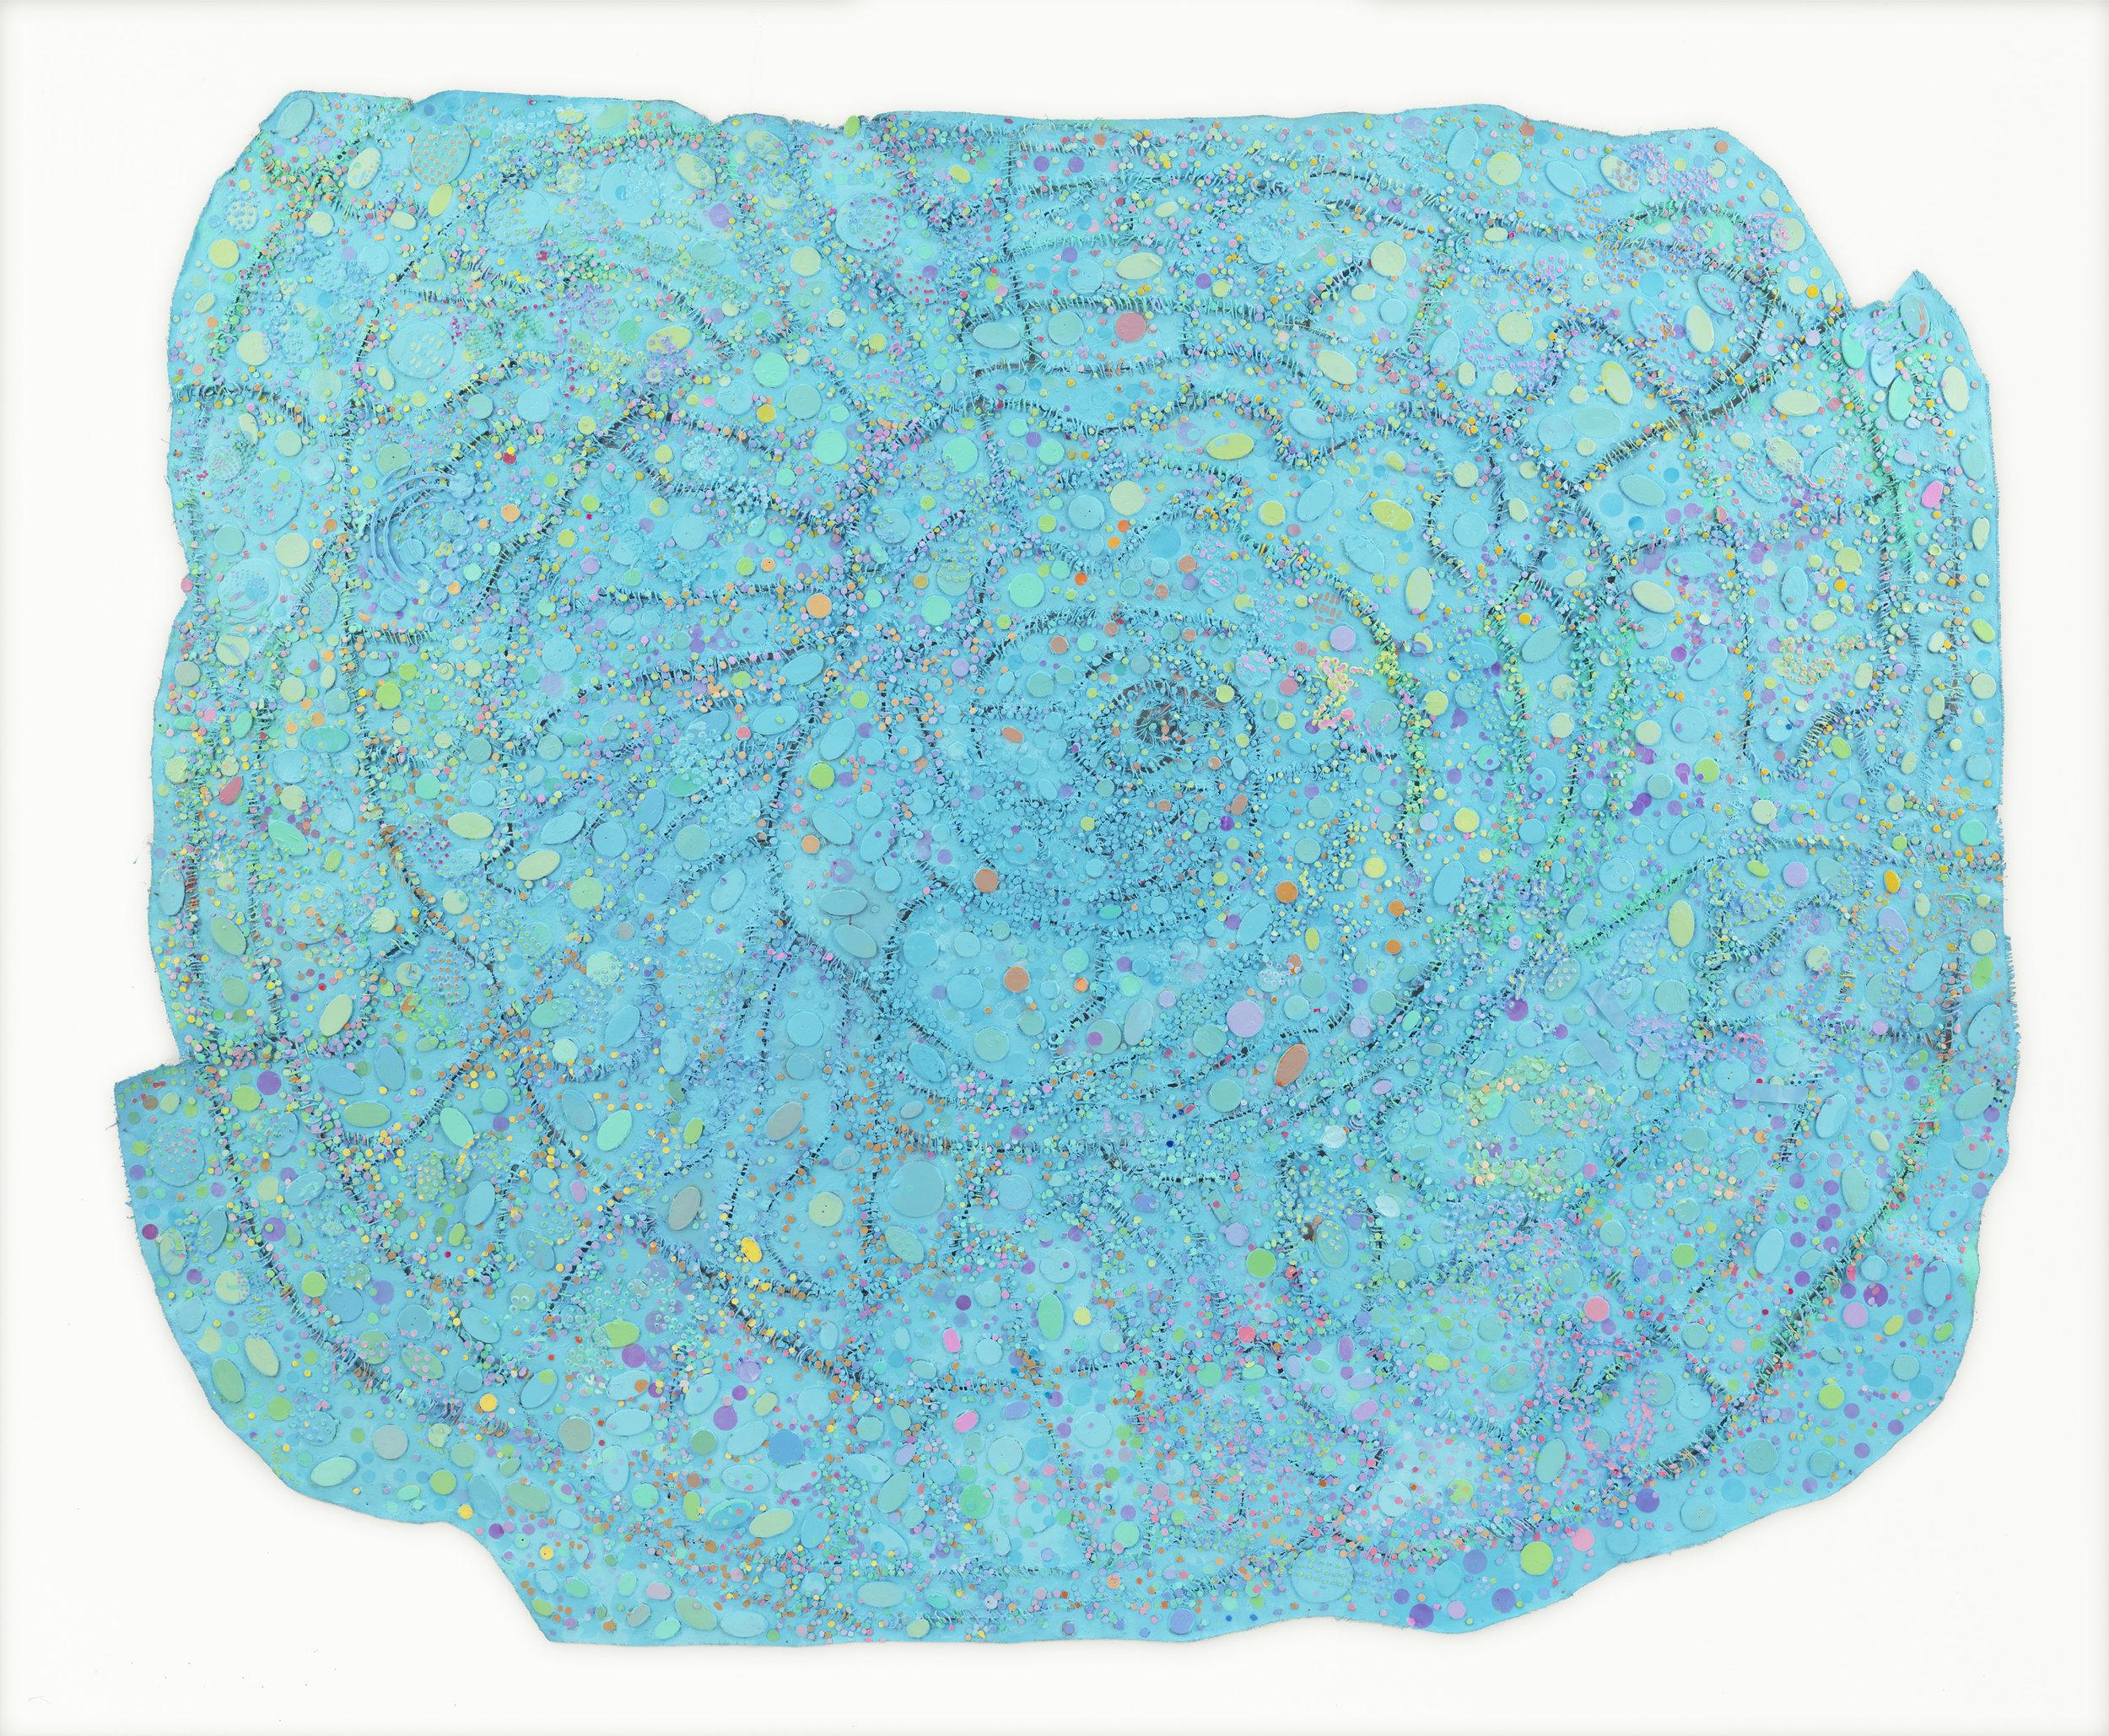 Howardena Pindell ,  Night Flight , 2015–2016.  Mixed media on canvas.  Image courtesy of the artist and Garth Greenan Gallery, New York.